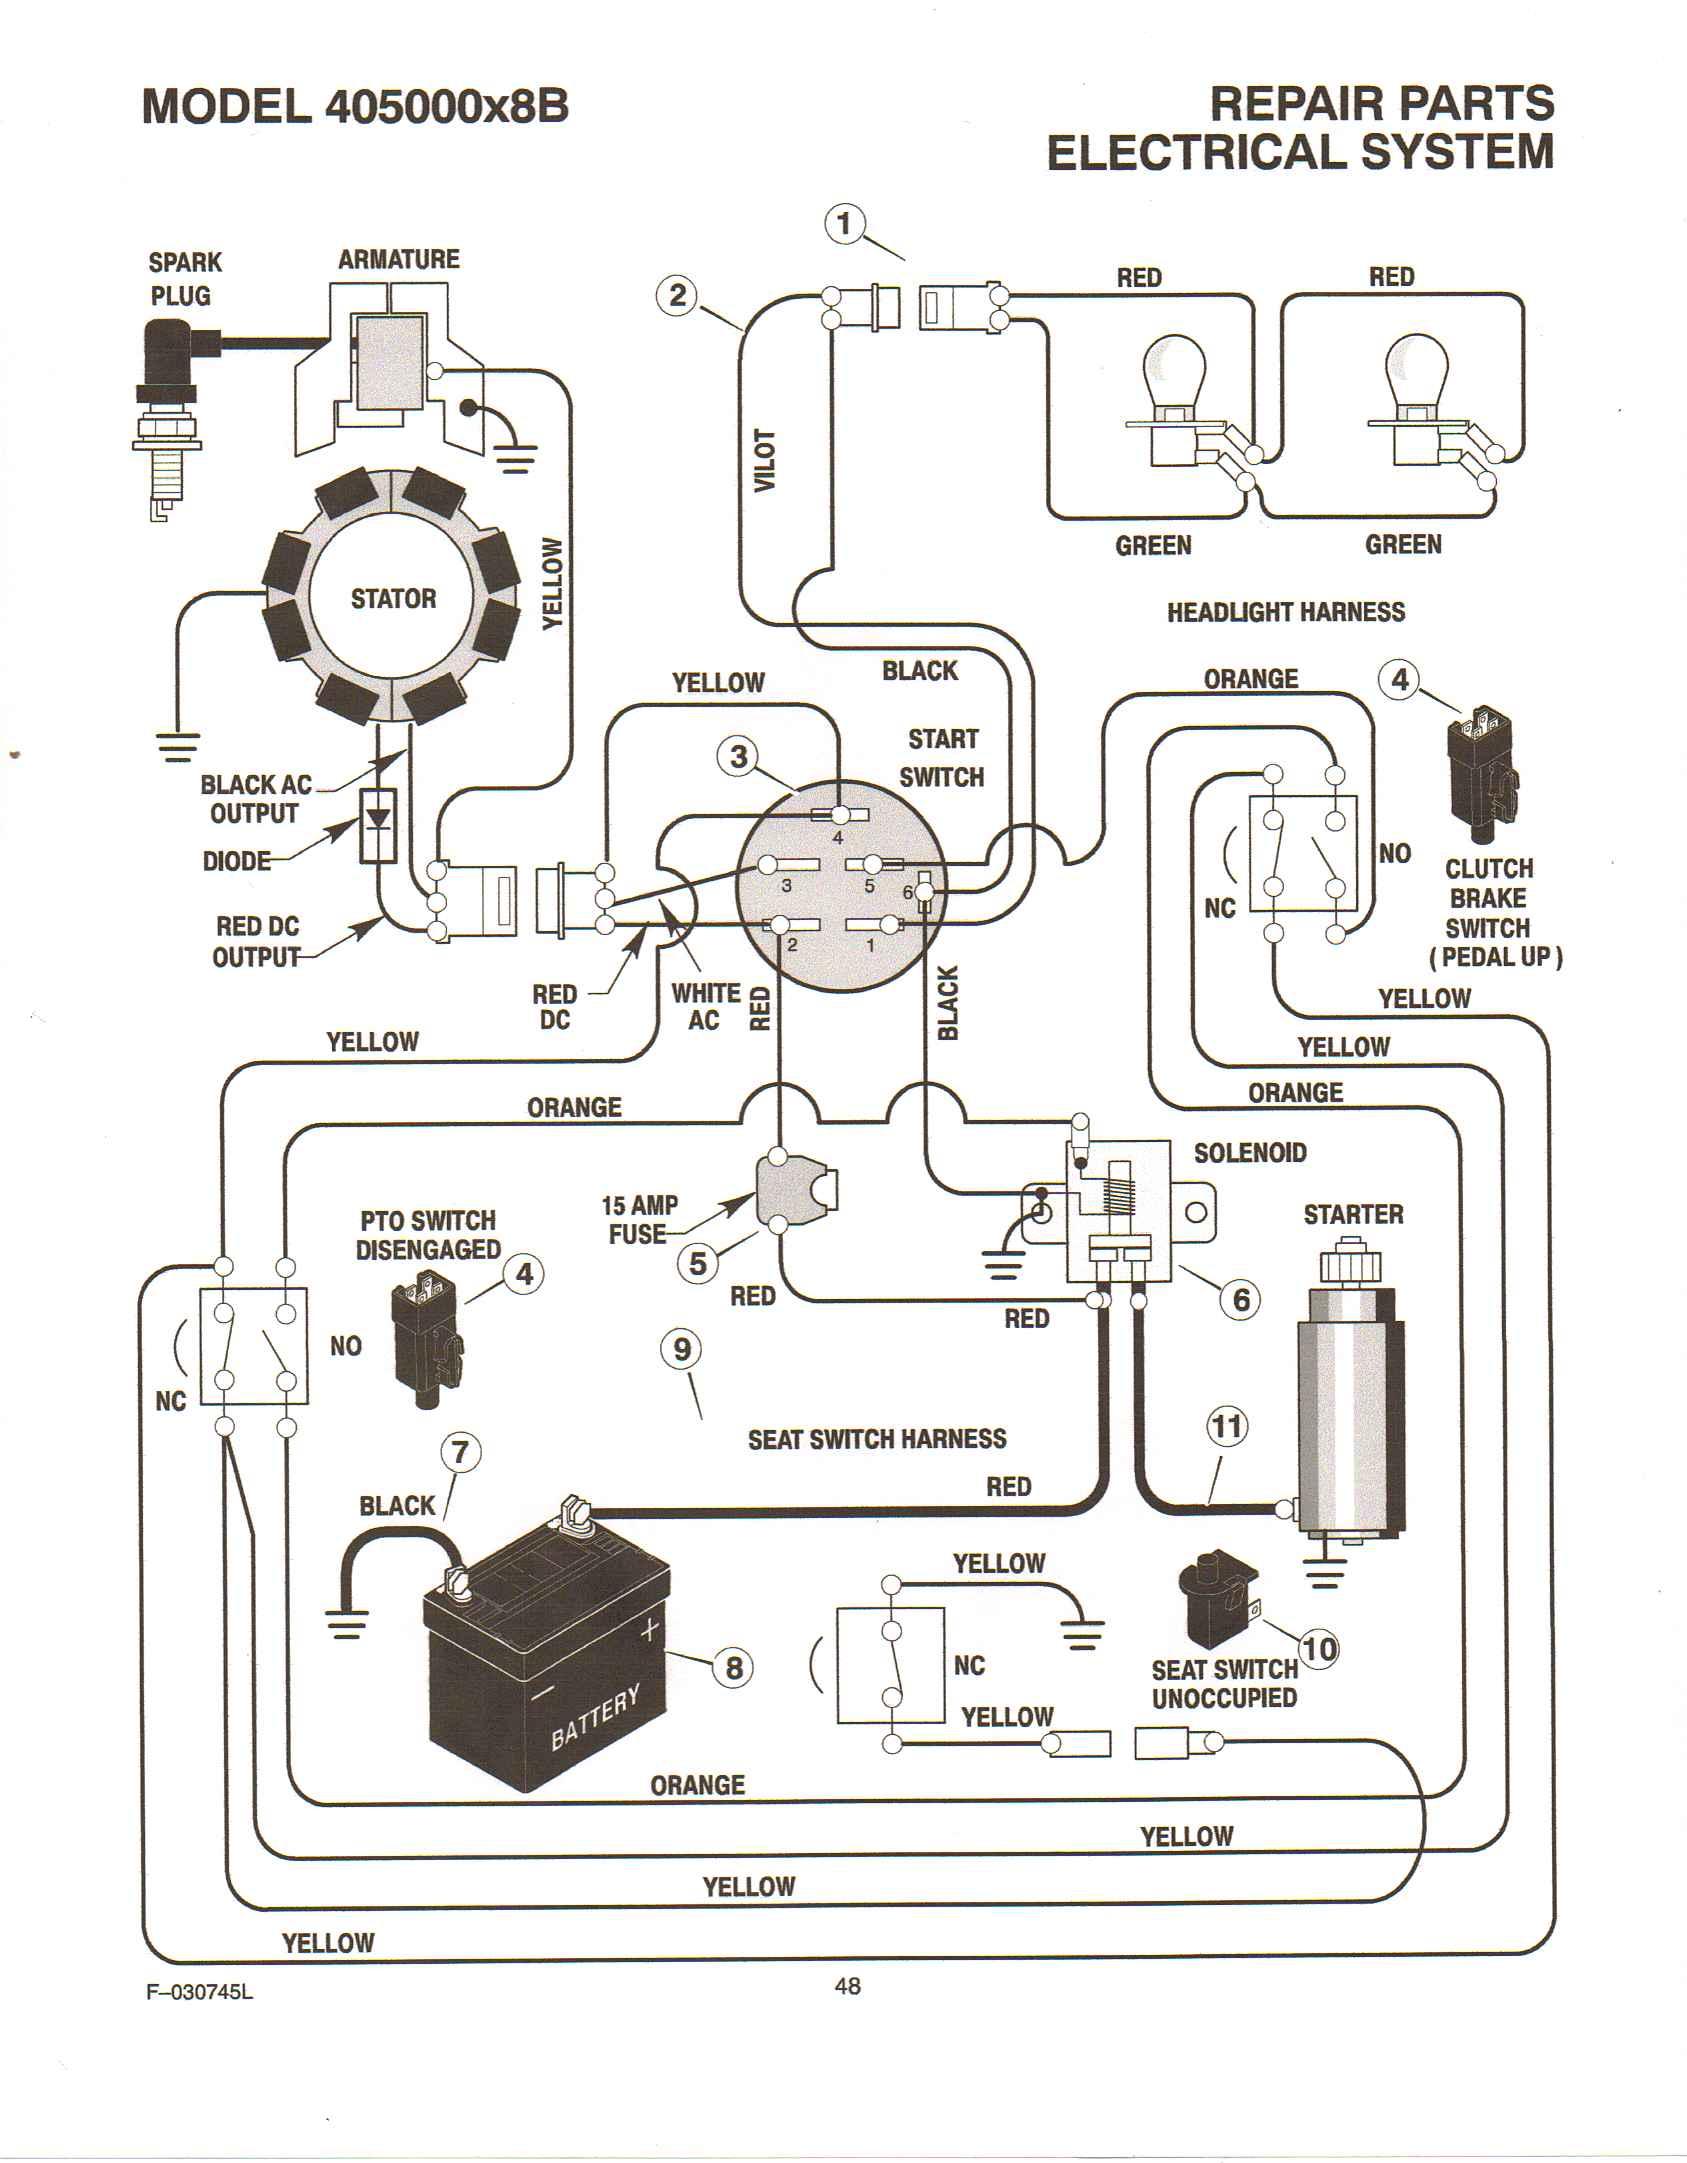 Kohler Wire Diagram - Wiring Diagram 500 on kohler ignition wiring, kohler valve, kohler compressor,